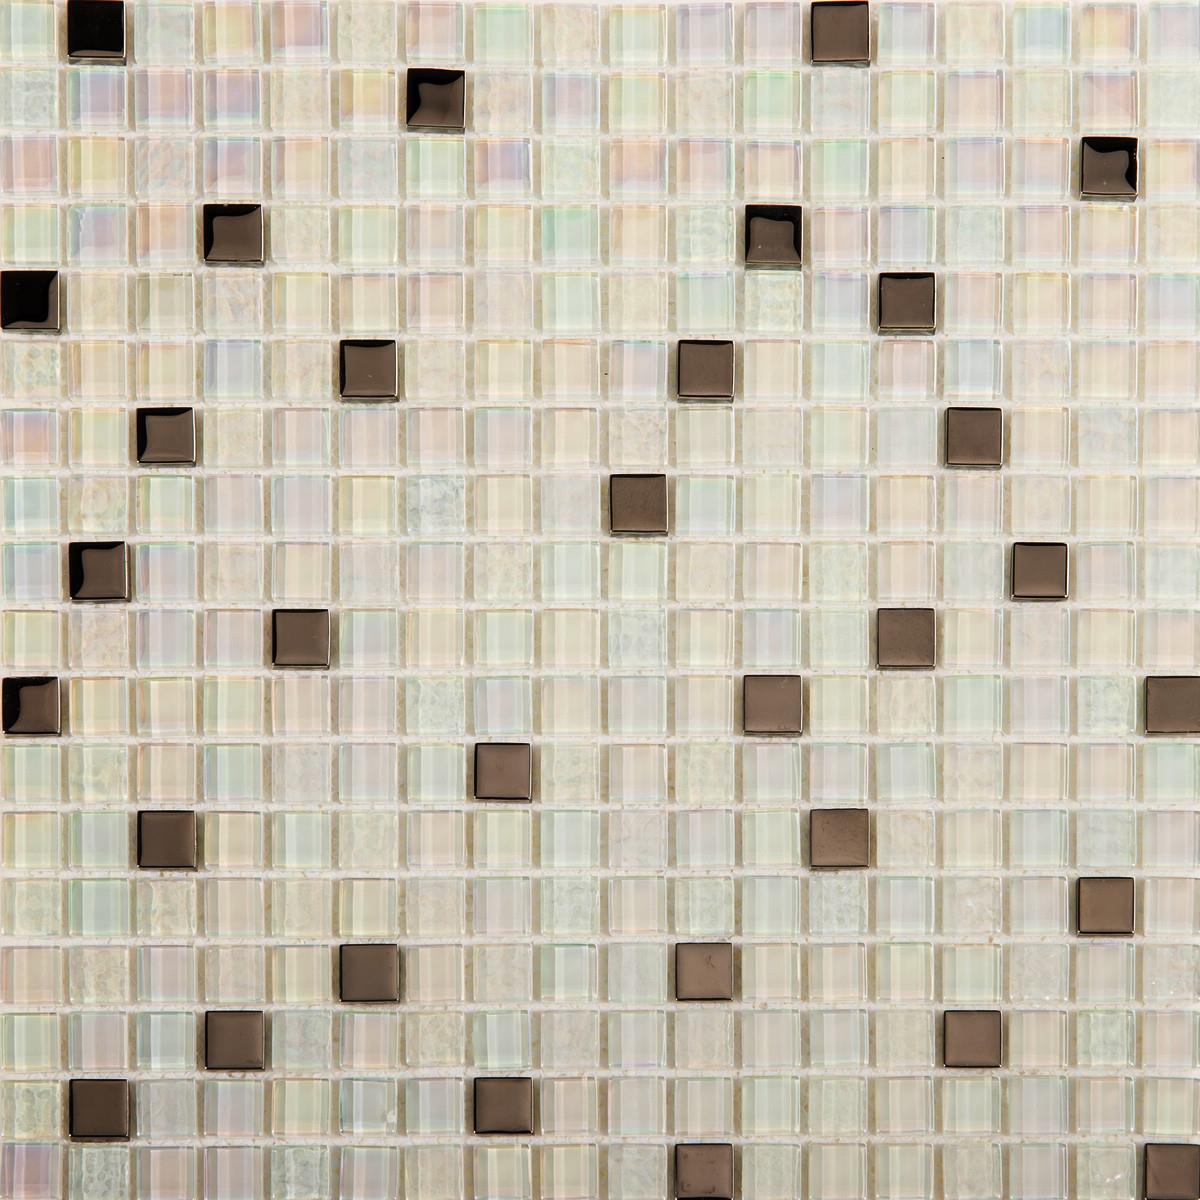 1 SQ M Weiß Iridescent Texturot and Smooth Glass Mosaic Tile Sheet 0143